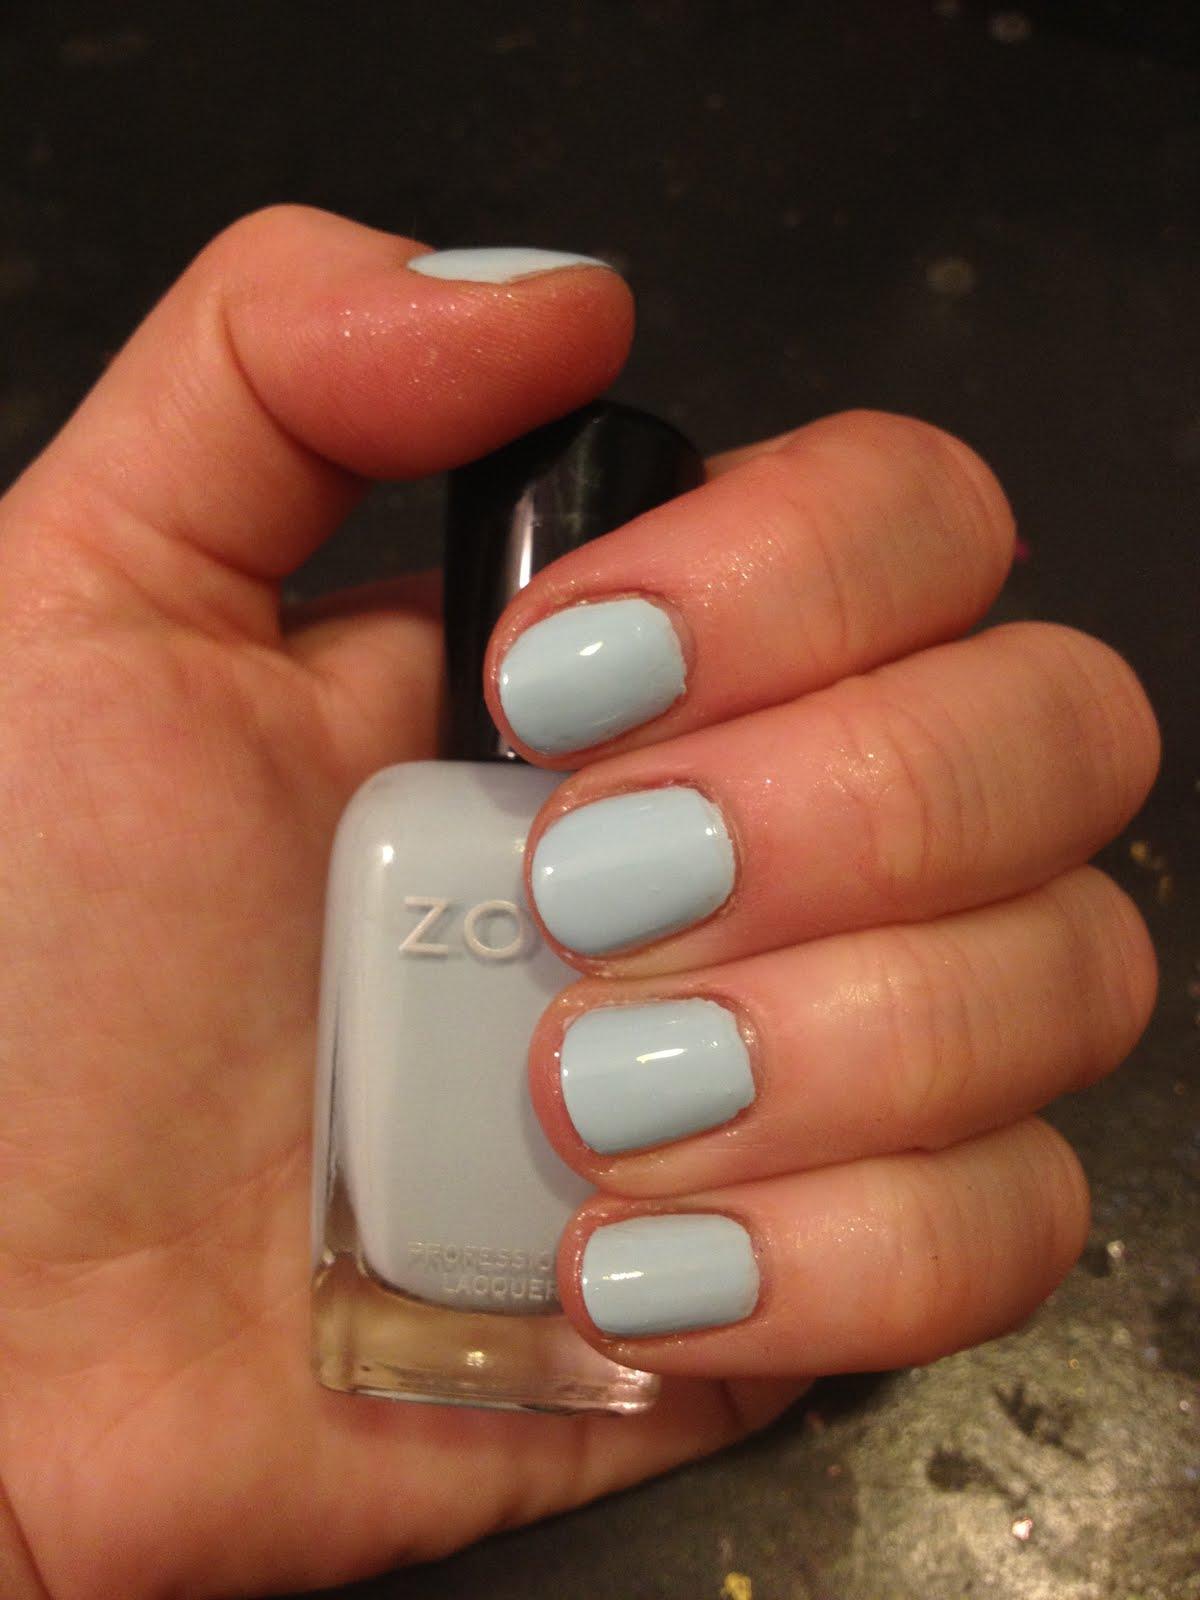 2013 most popular toe nail color 2013 toe nail color foot